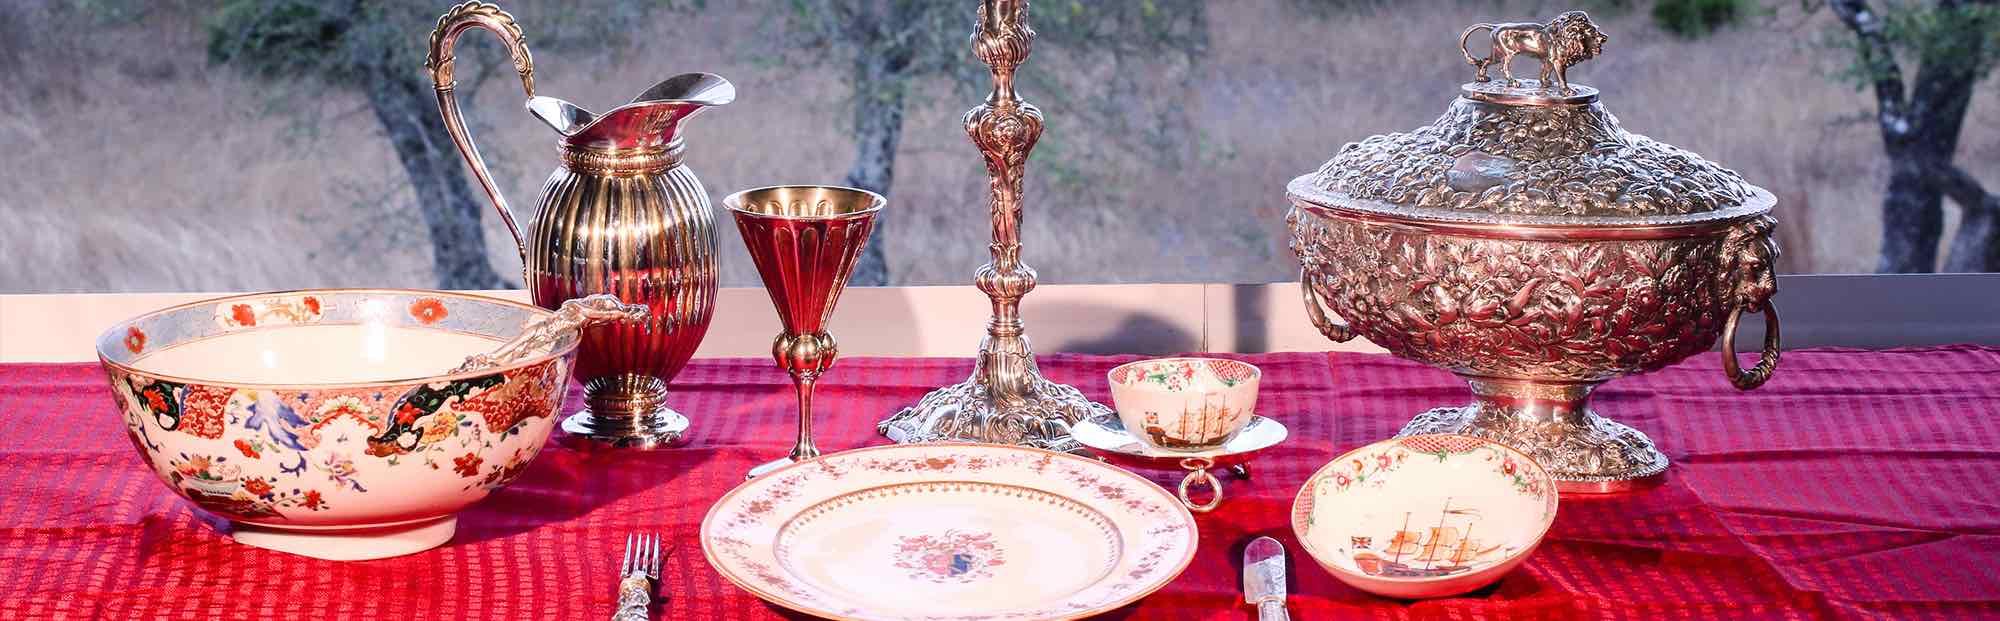 iGavel Interiors: San Antonio, Texas - Settings for a Beautiful Table